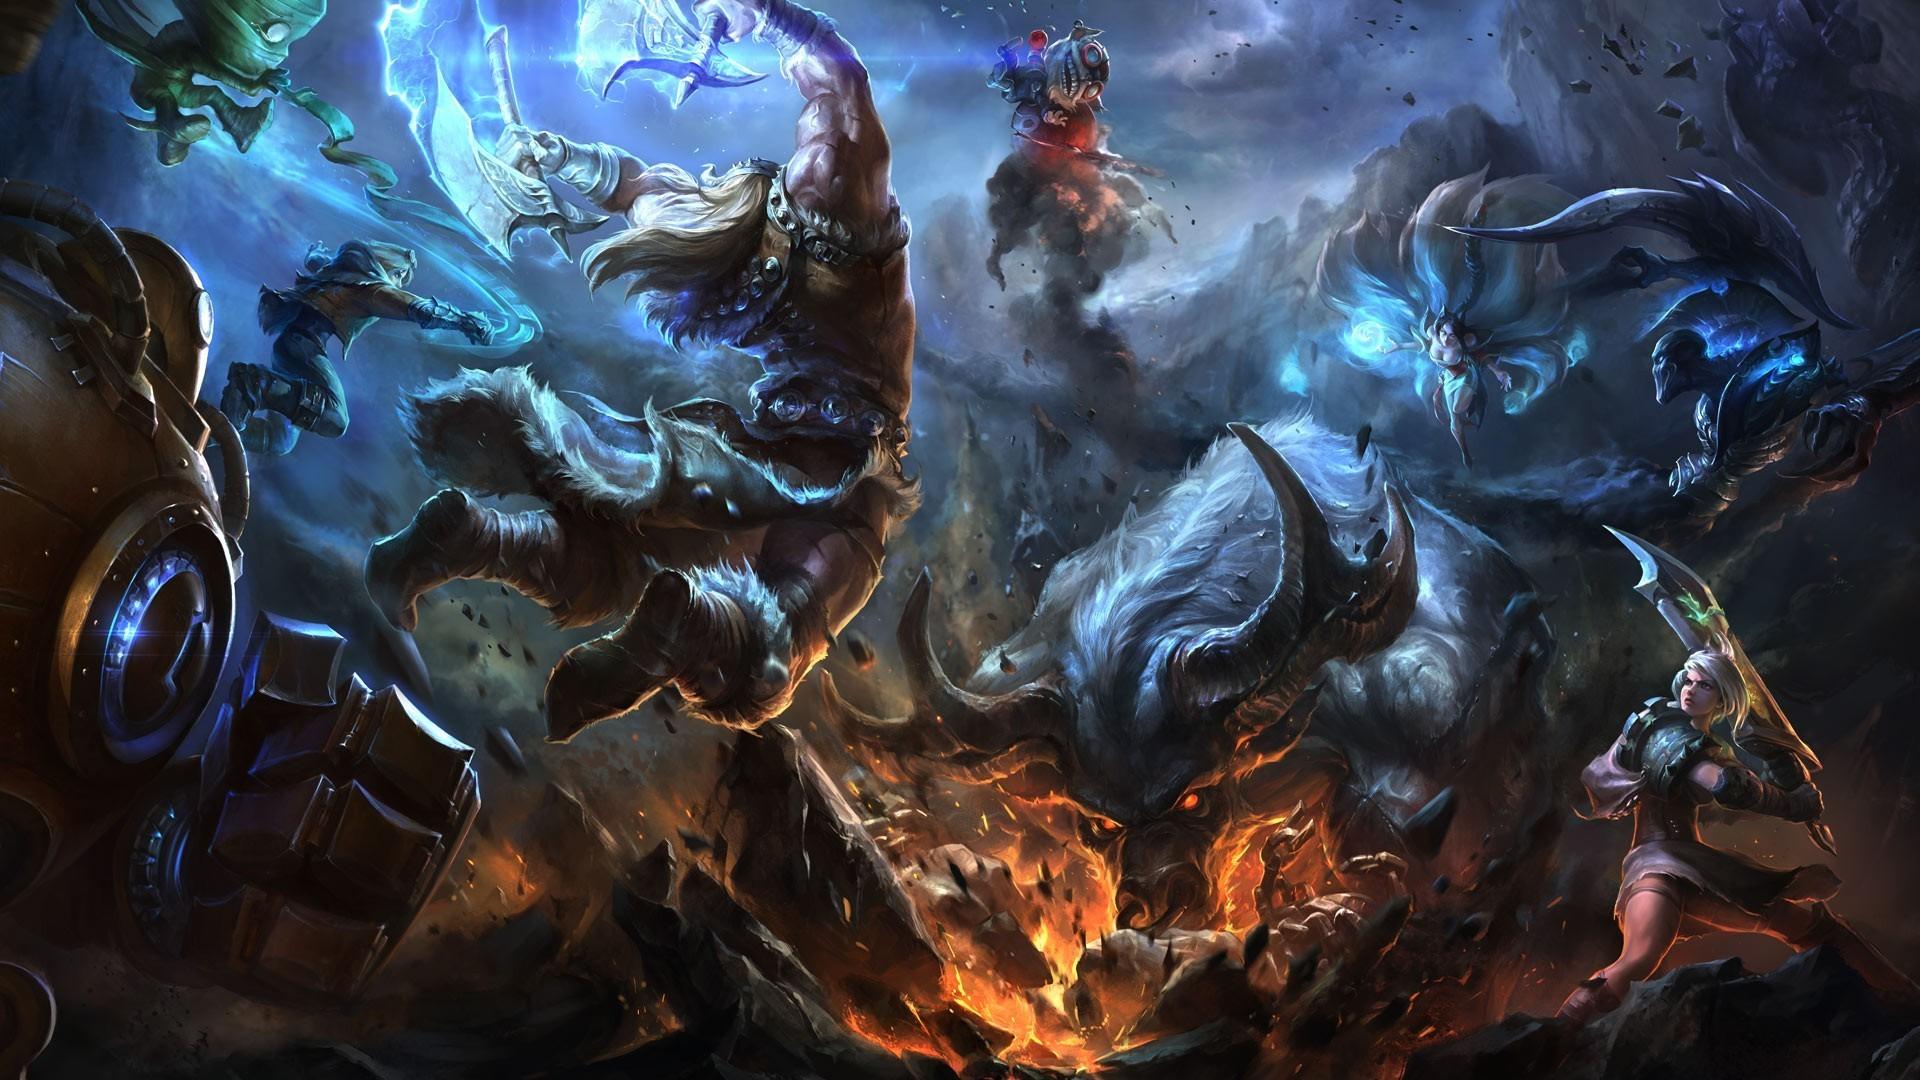 45 Hd League Of Legends Wallpapers On Wallpapersafari